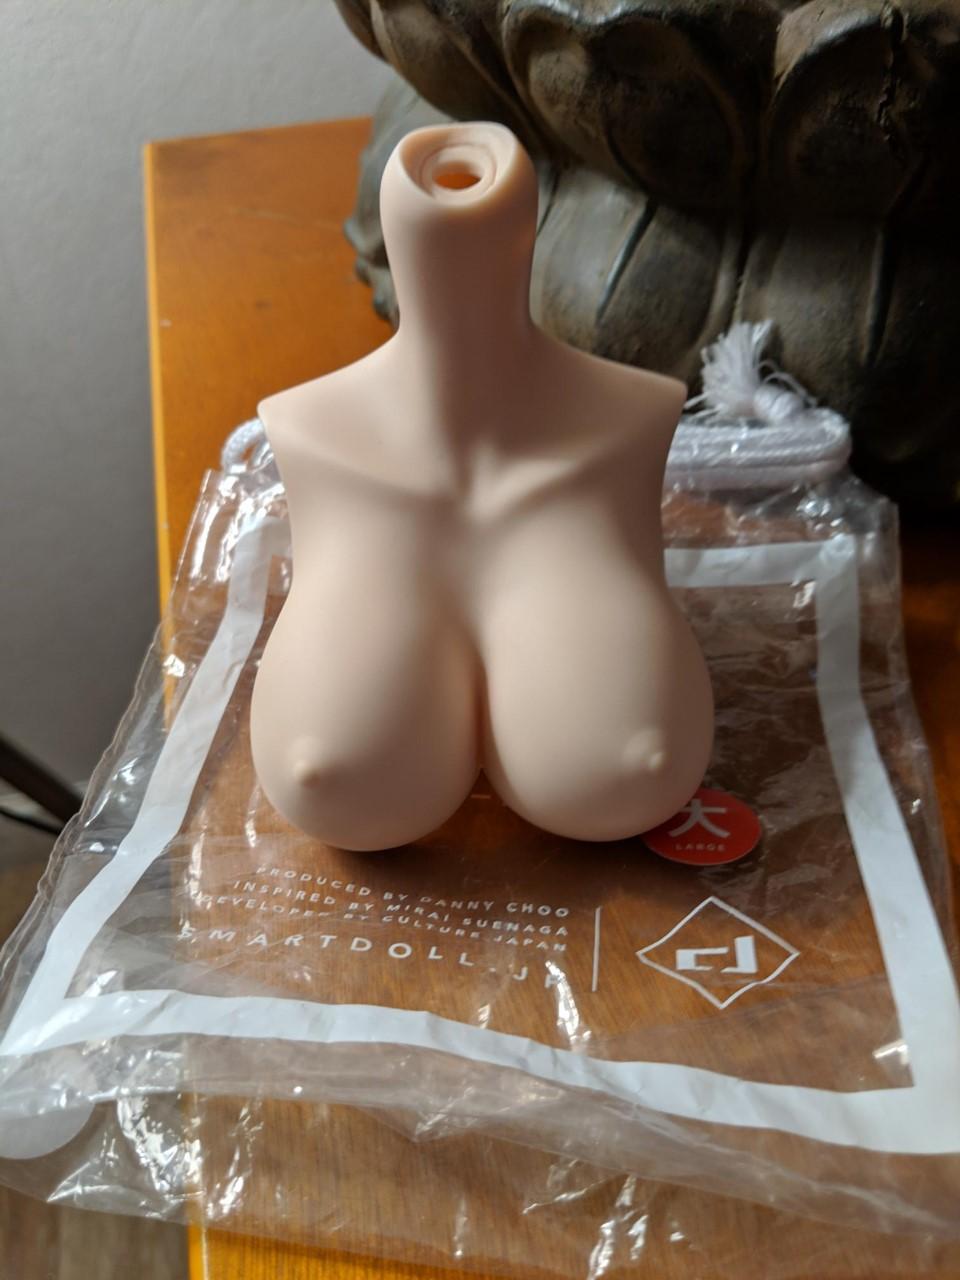 [ventes/Ech]pleins de dolls Ajout Chara PARABOX FDP OFFERT Thumbn21